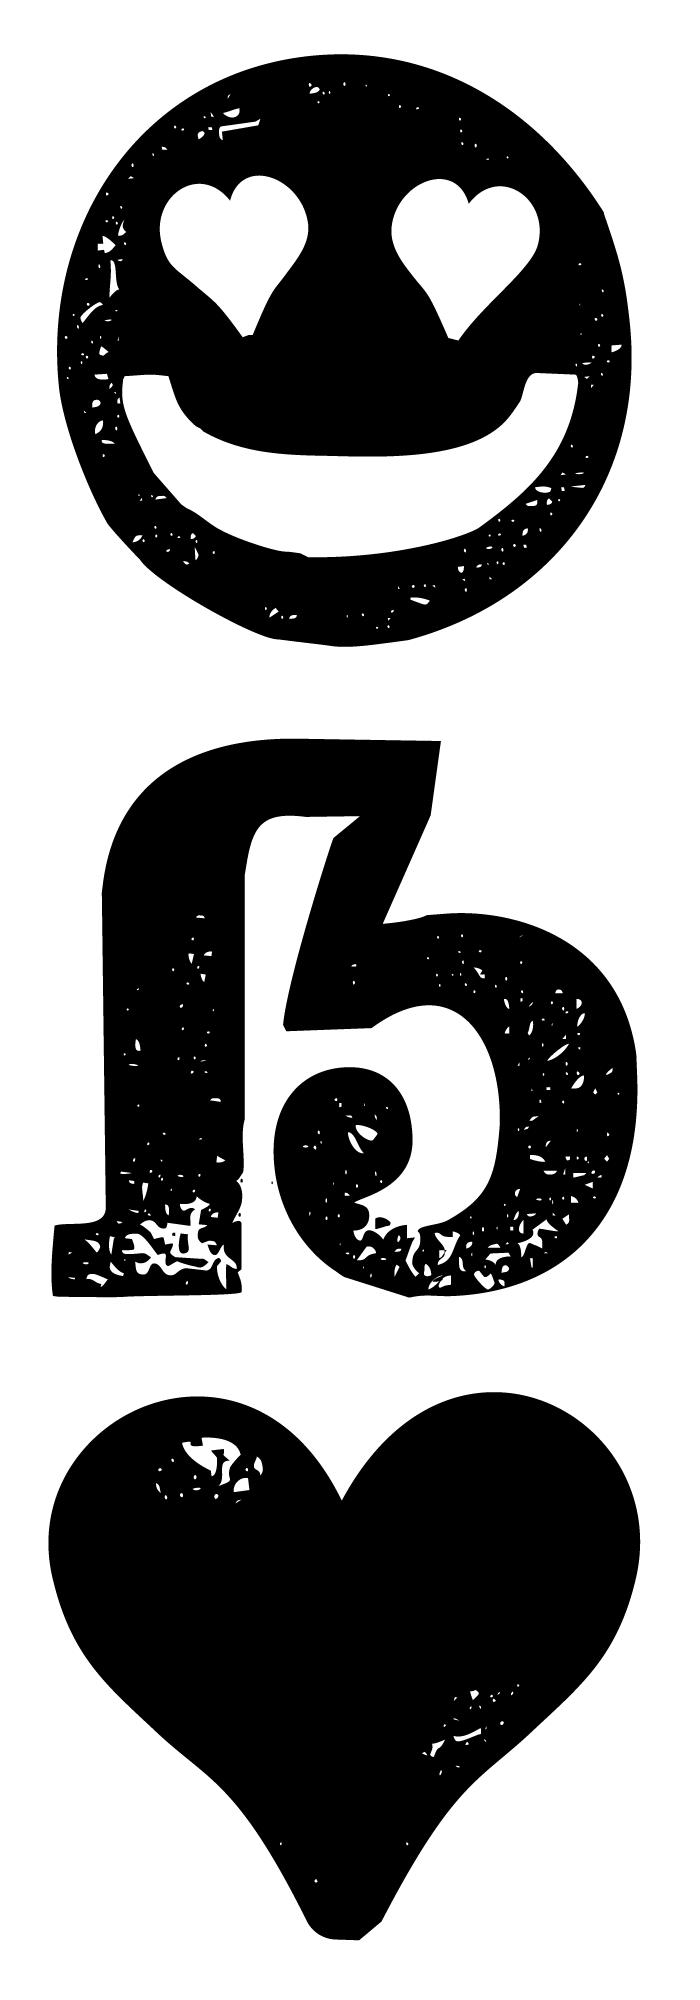 font-sample_Hand-Stamp-Slab-Serif-Rough_700px